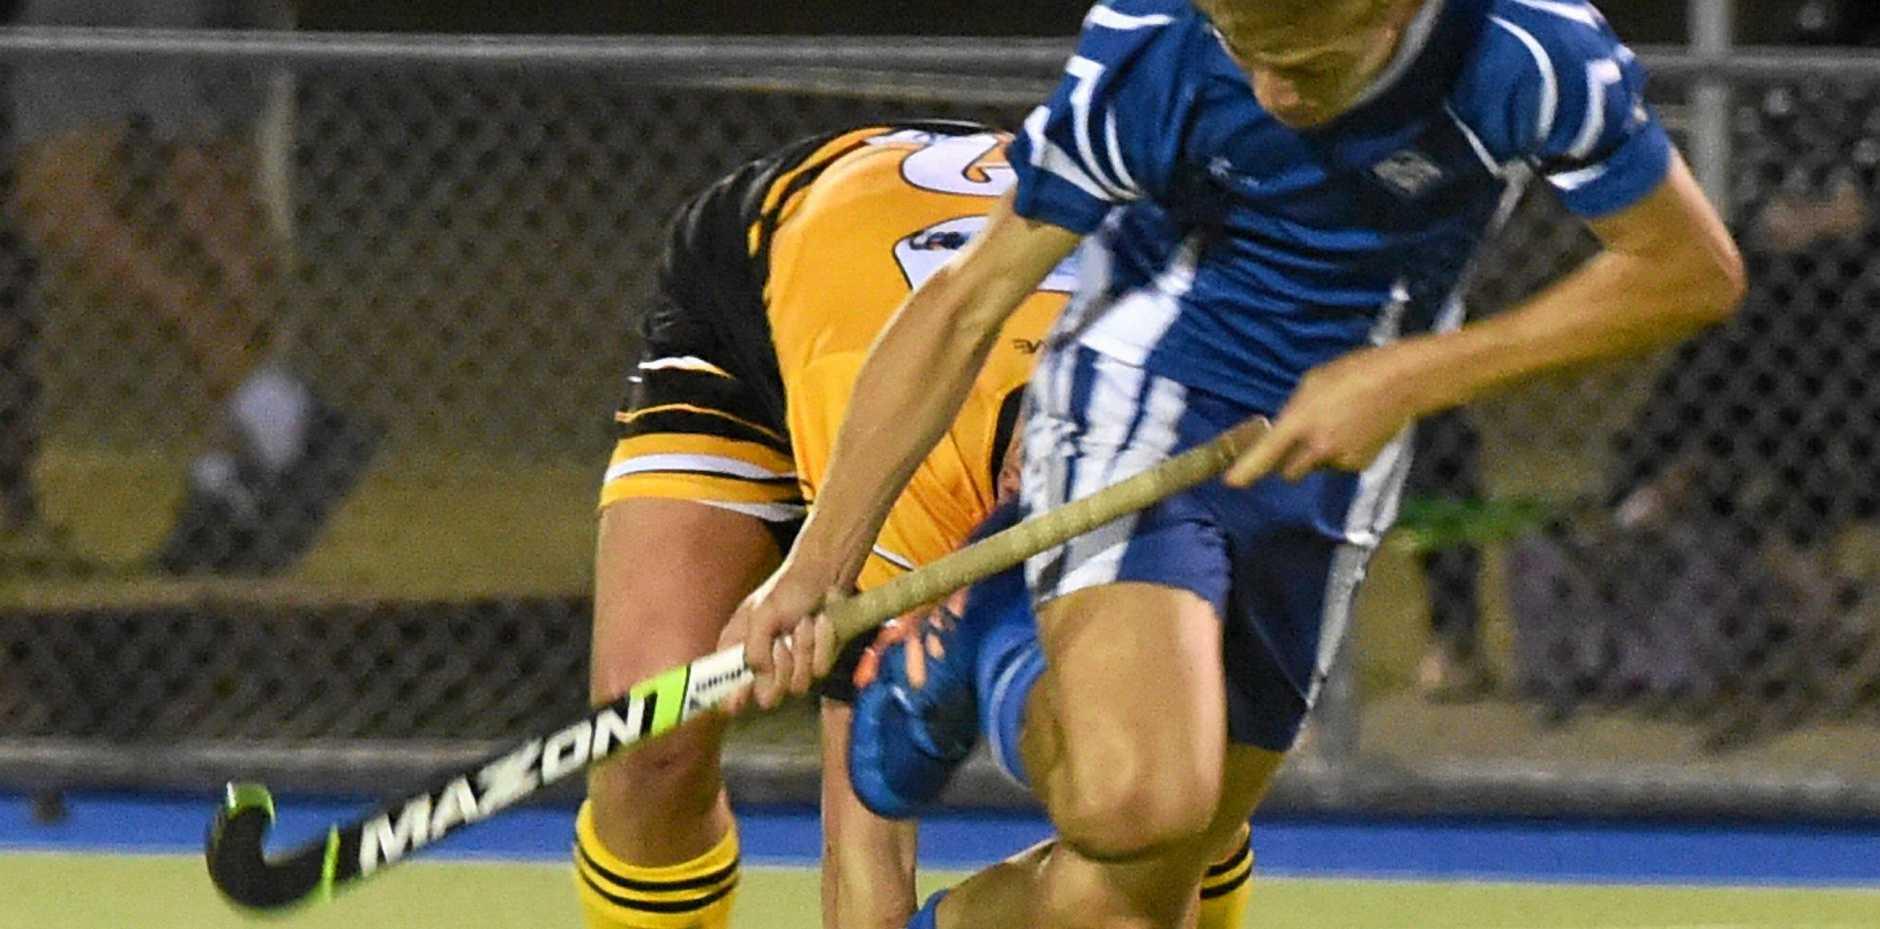 GOTCHA: Granville's Blake Kroning makes a tackle on Wallaroos goalscorer Jaspa Wright during the Maryborough Hockey Division 1 grand final.